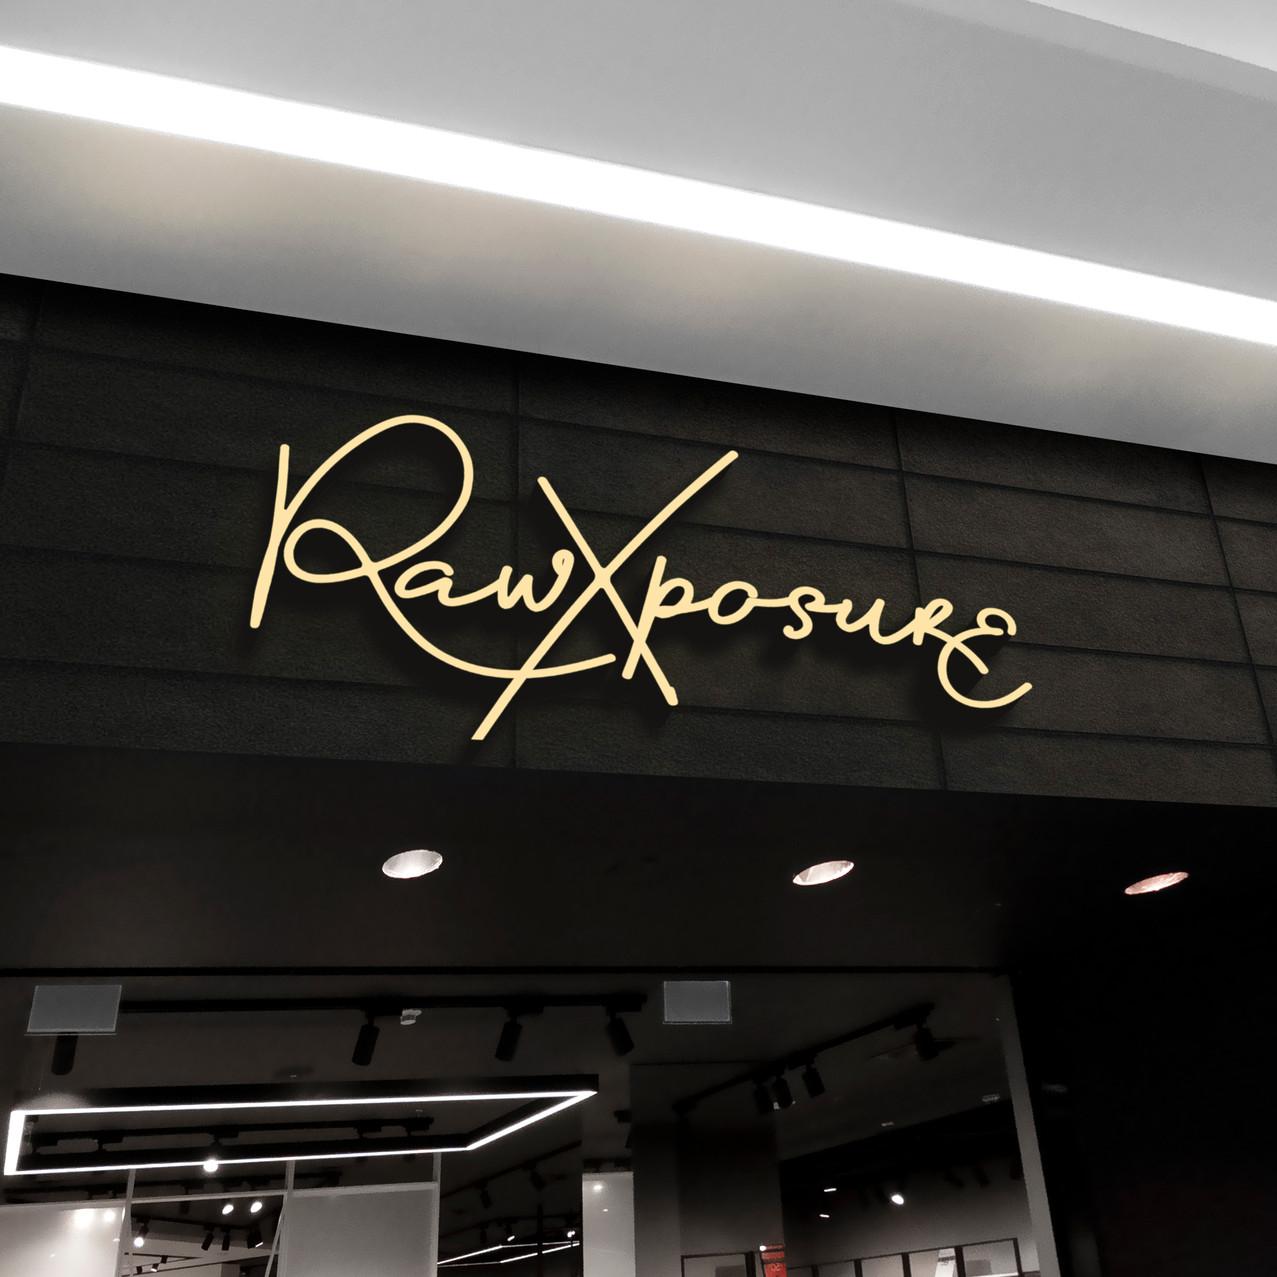 RawXposure Store Sign mockup.jpg